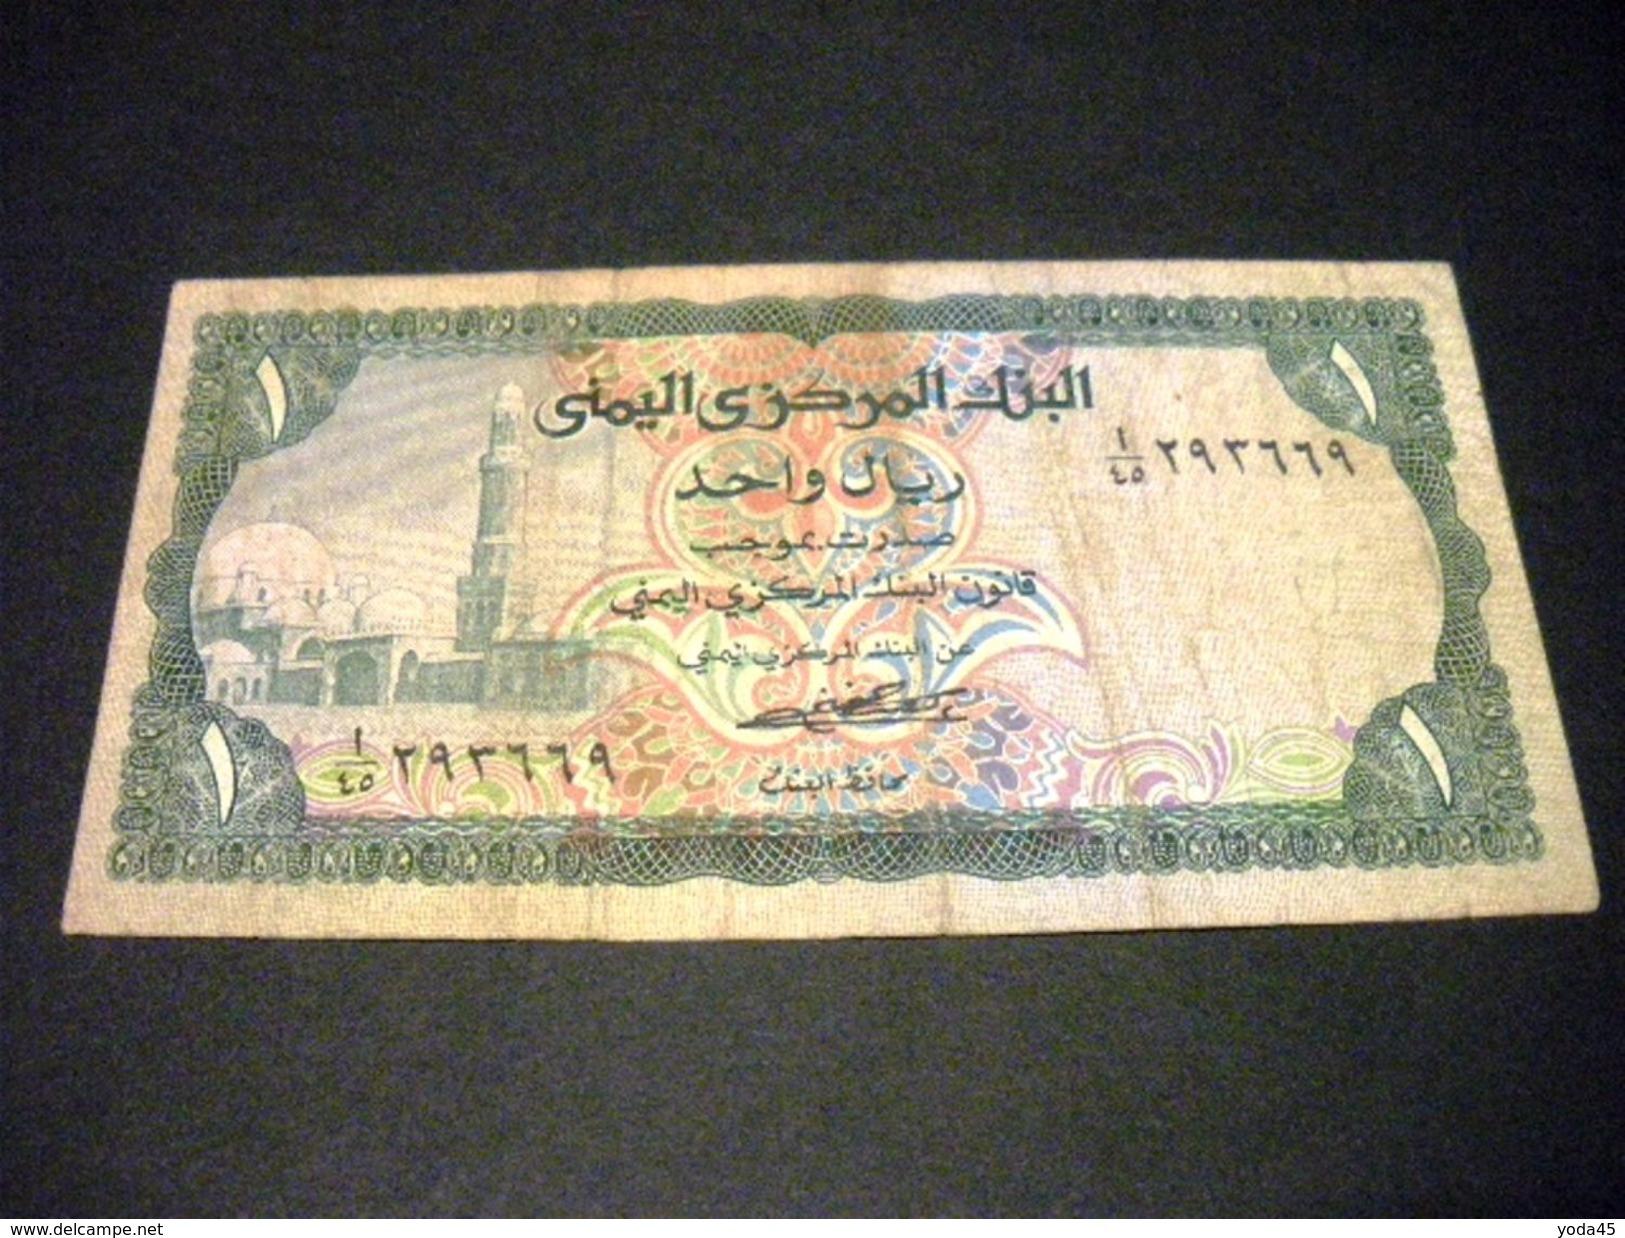 YEMEN 1 Rial 1973 , Pick N° 11 A ,YEMEN ARAB REPUPLIC - Yémen